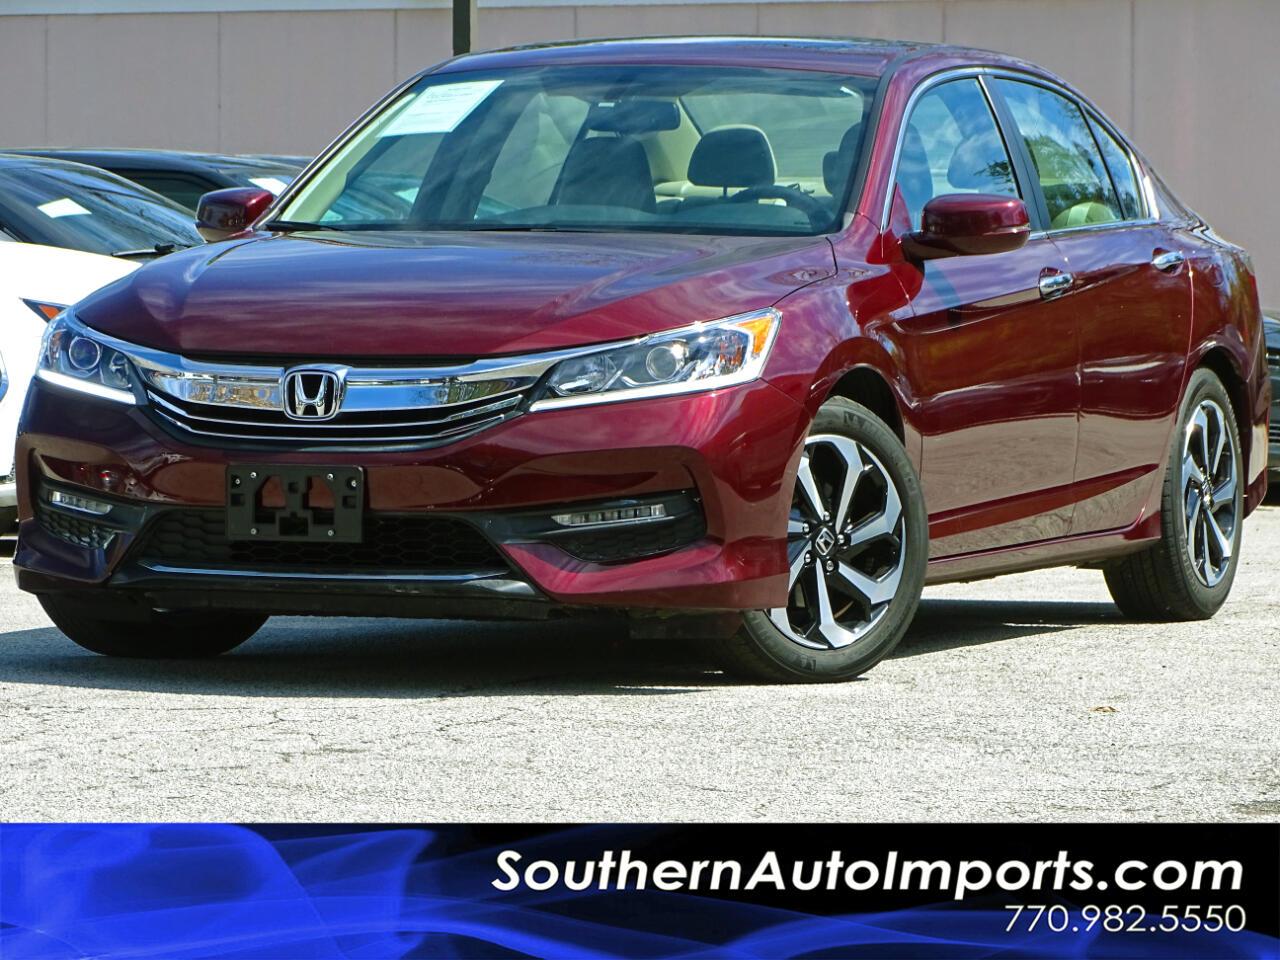 2016 Honda Accord Sedan EX-L w/Back Up Camera Memory Seats Heated Seats